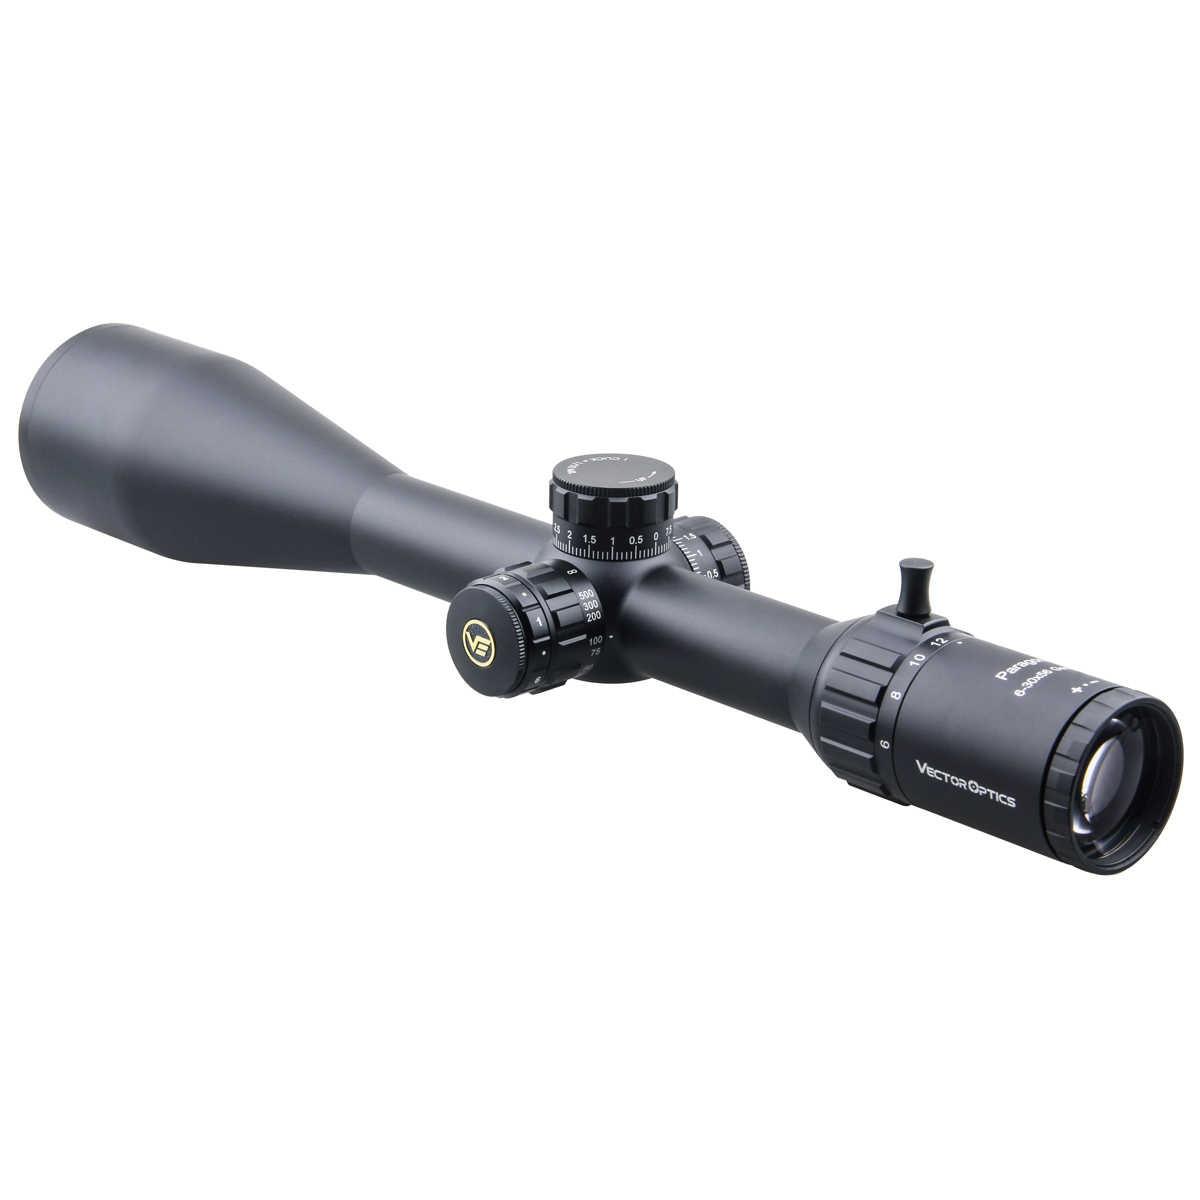 Ótica do vetor gen2 paragon 6-30x56 caça riflescope óptico tático escopo 1/10 mil 90% luz de longo alcance tiro preciso. 338